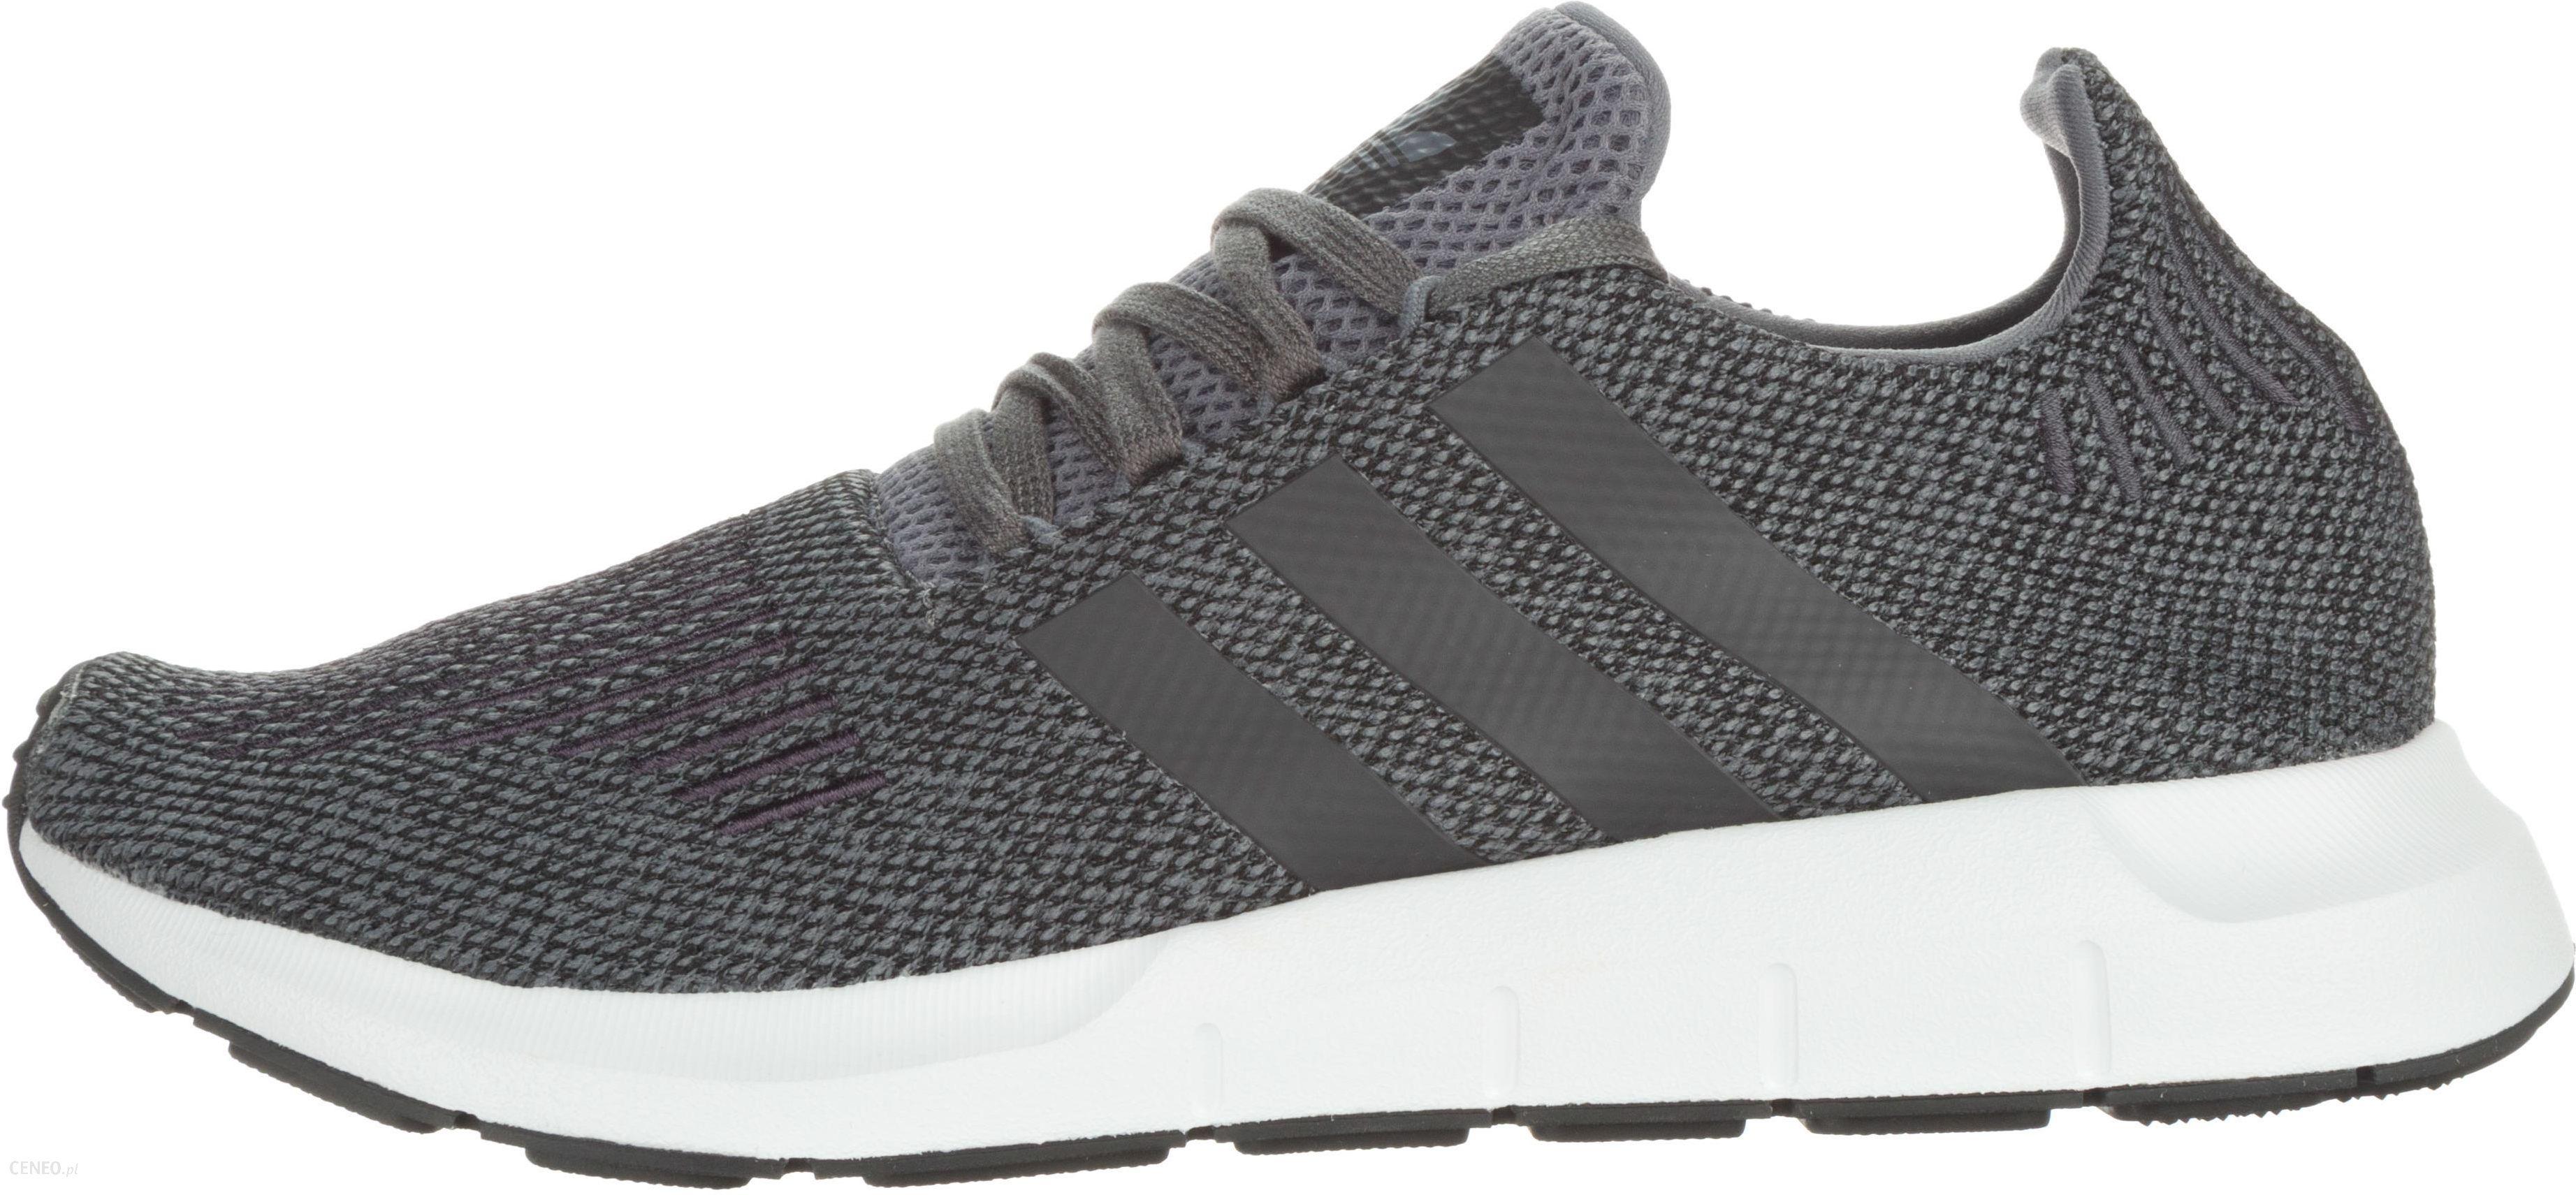 Adidas Originals Swift Run Sneakers Szary 40 23 Ceny i opinie Ceneo.pl